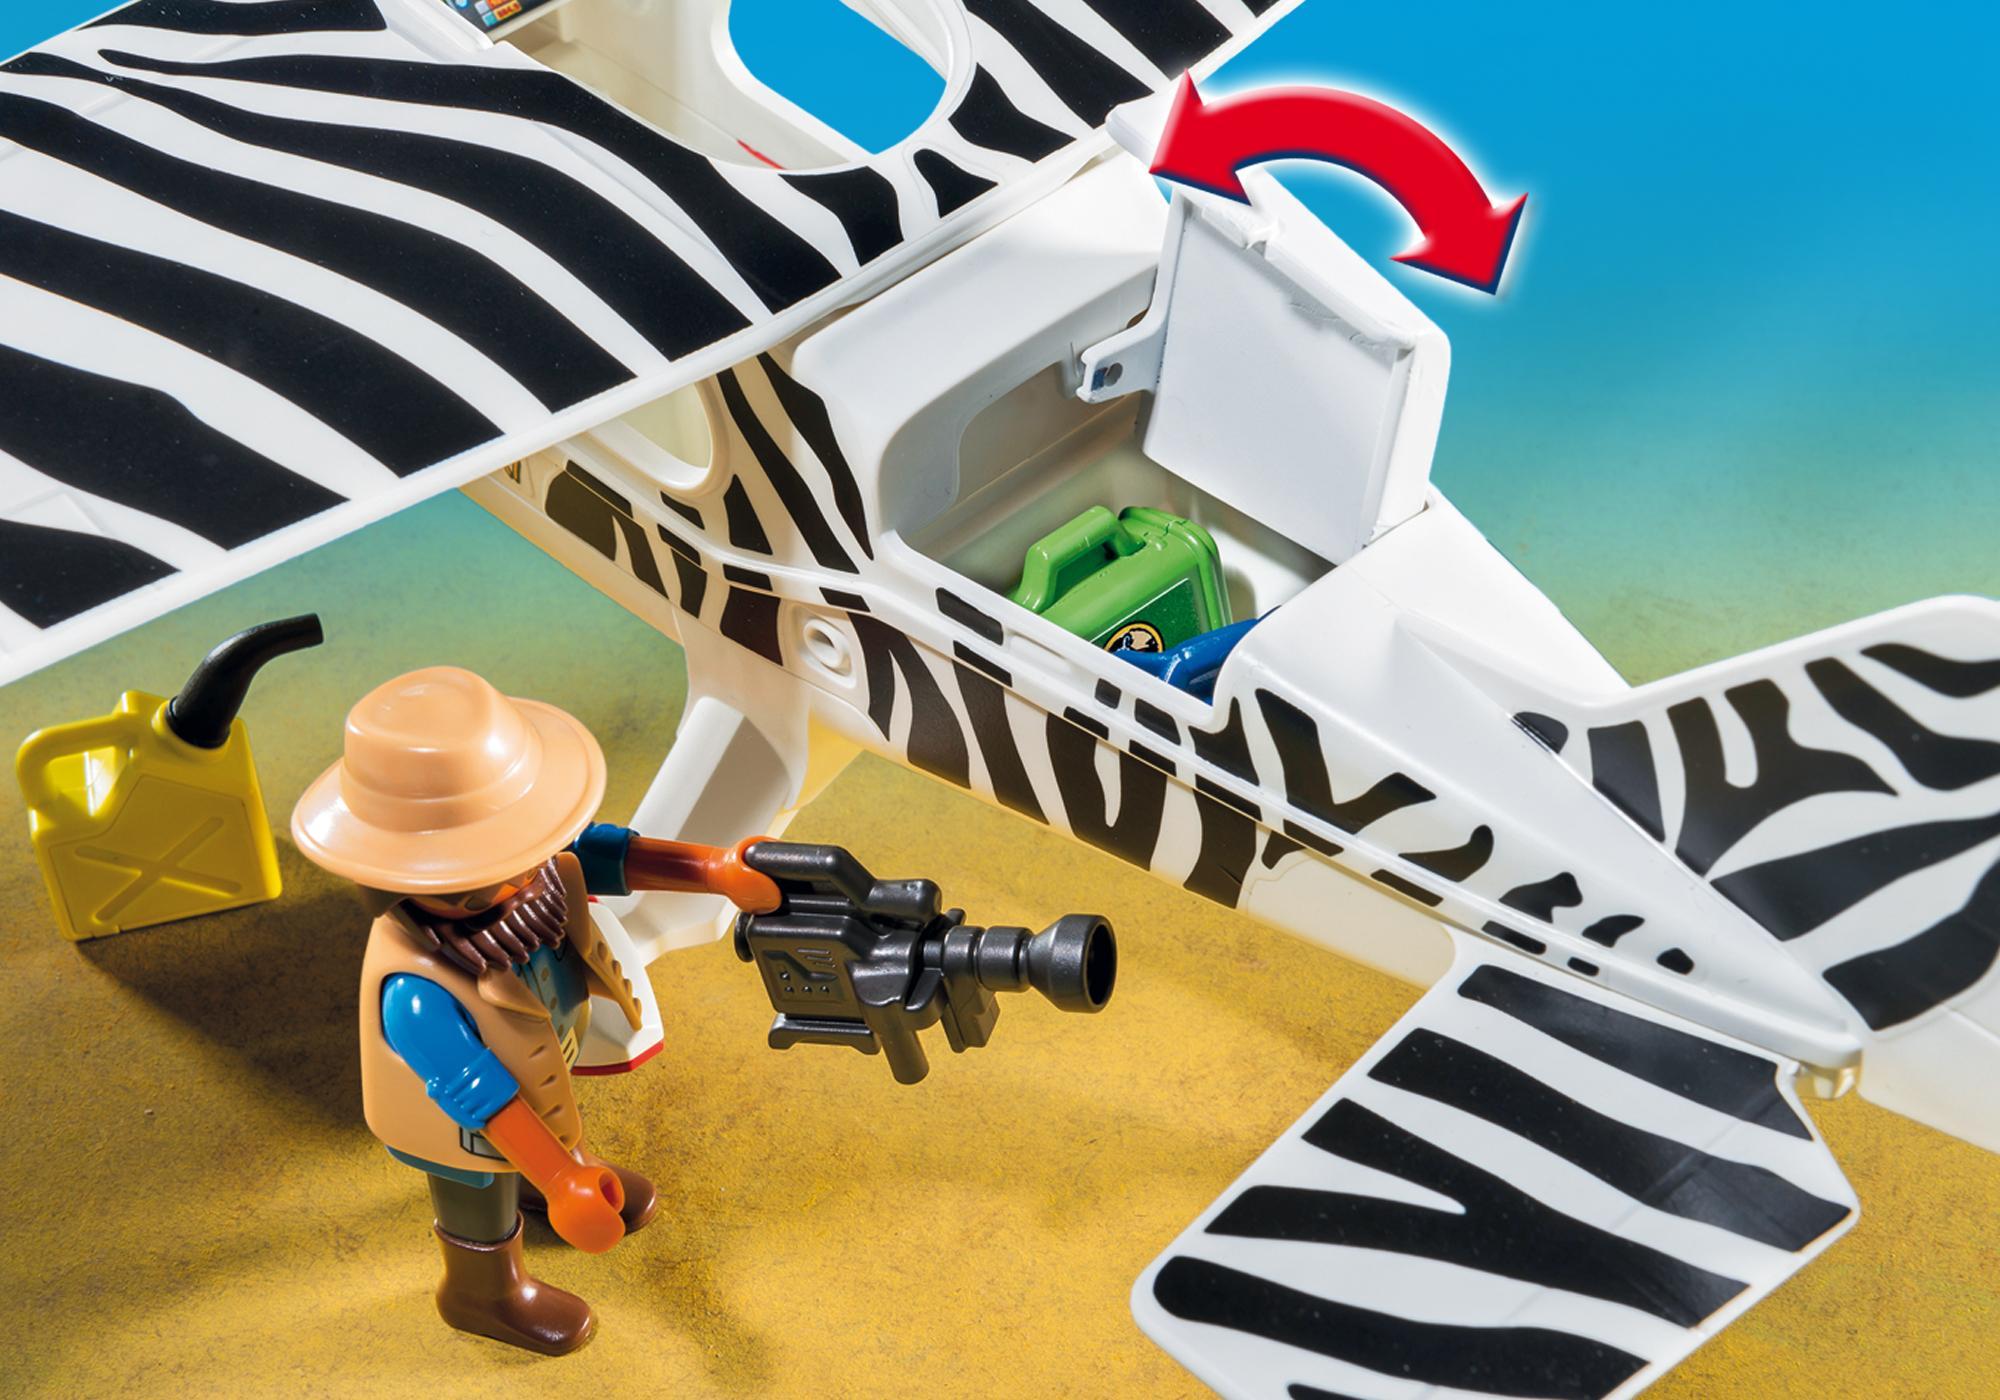 http://media.playmobil.com/i/playmobil/6938_product_extra1/Safari-Flugzeug